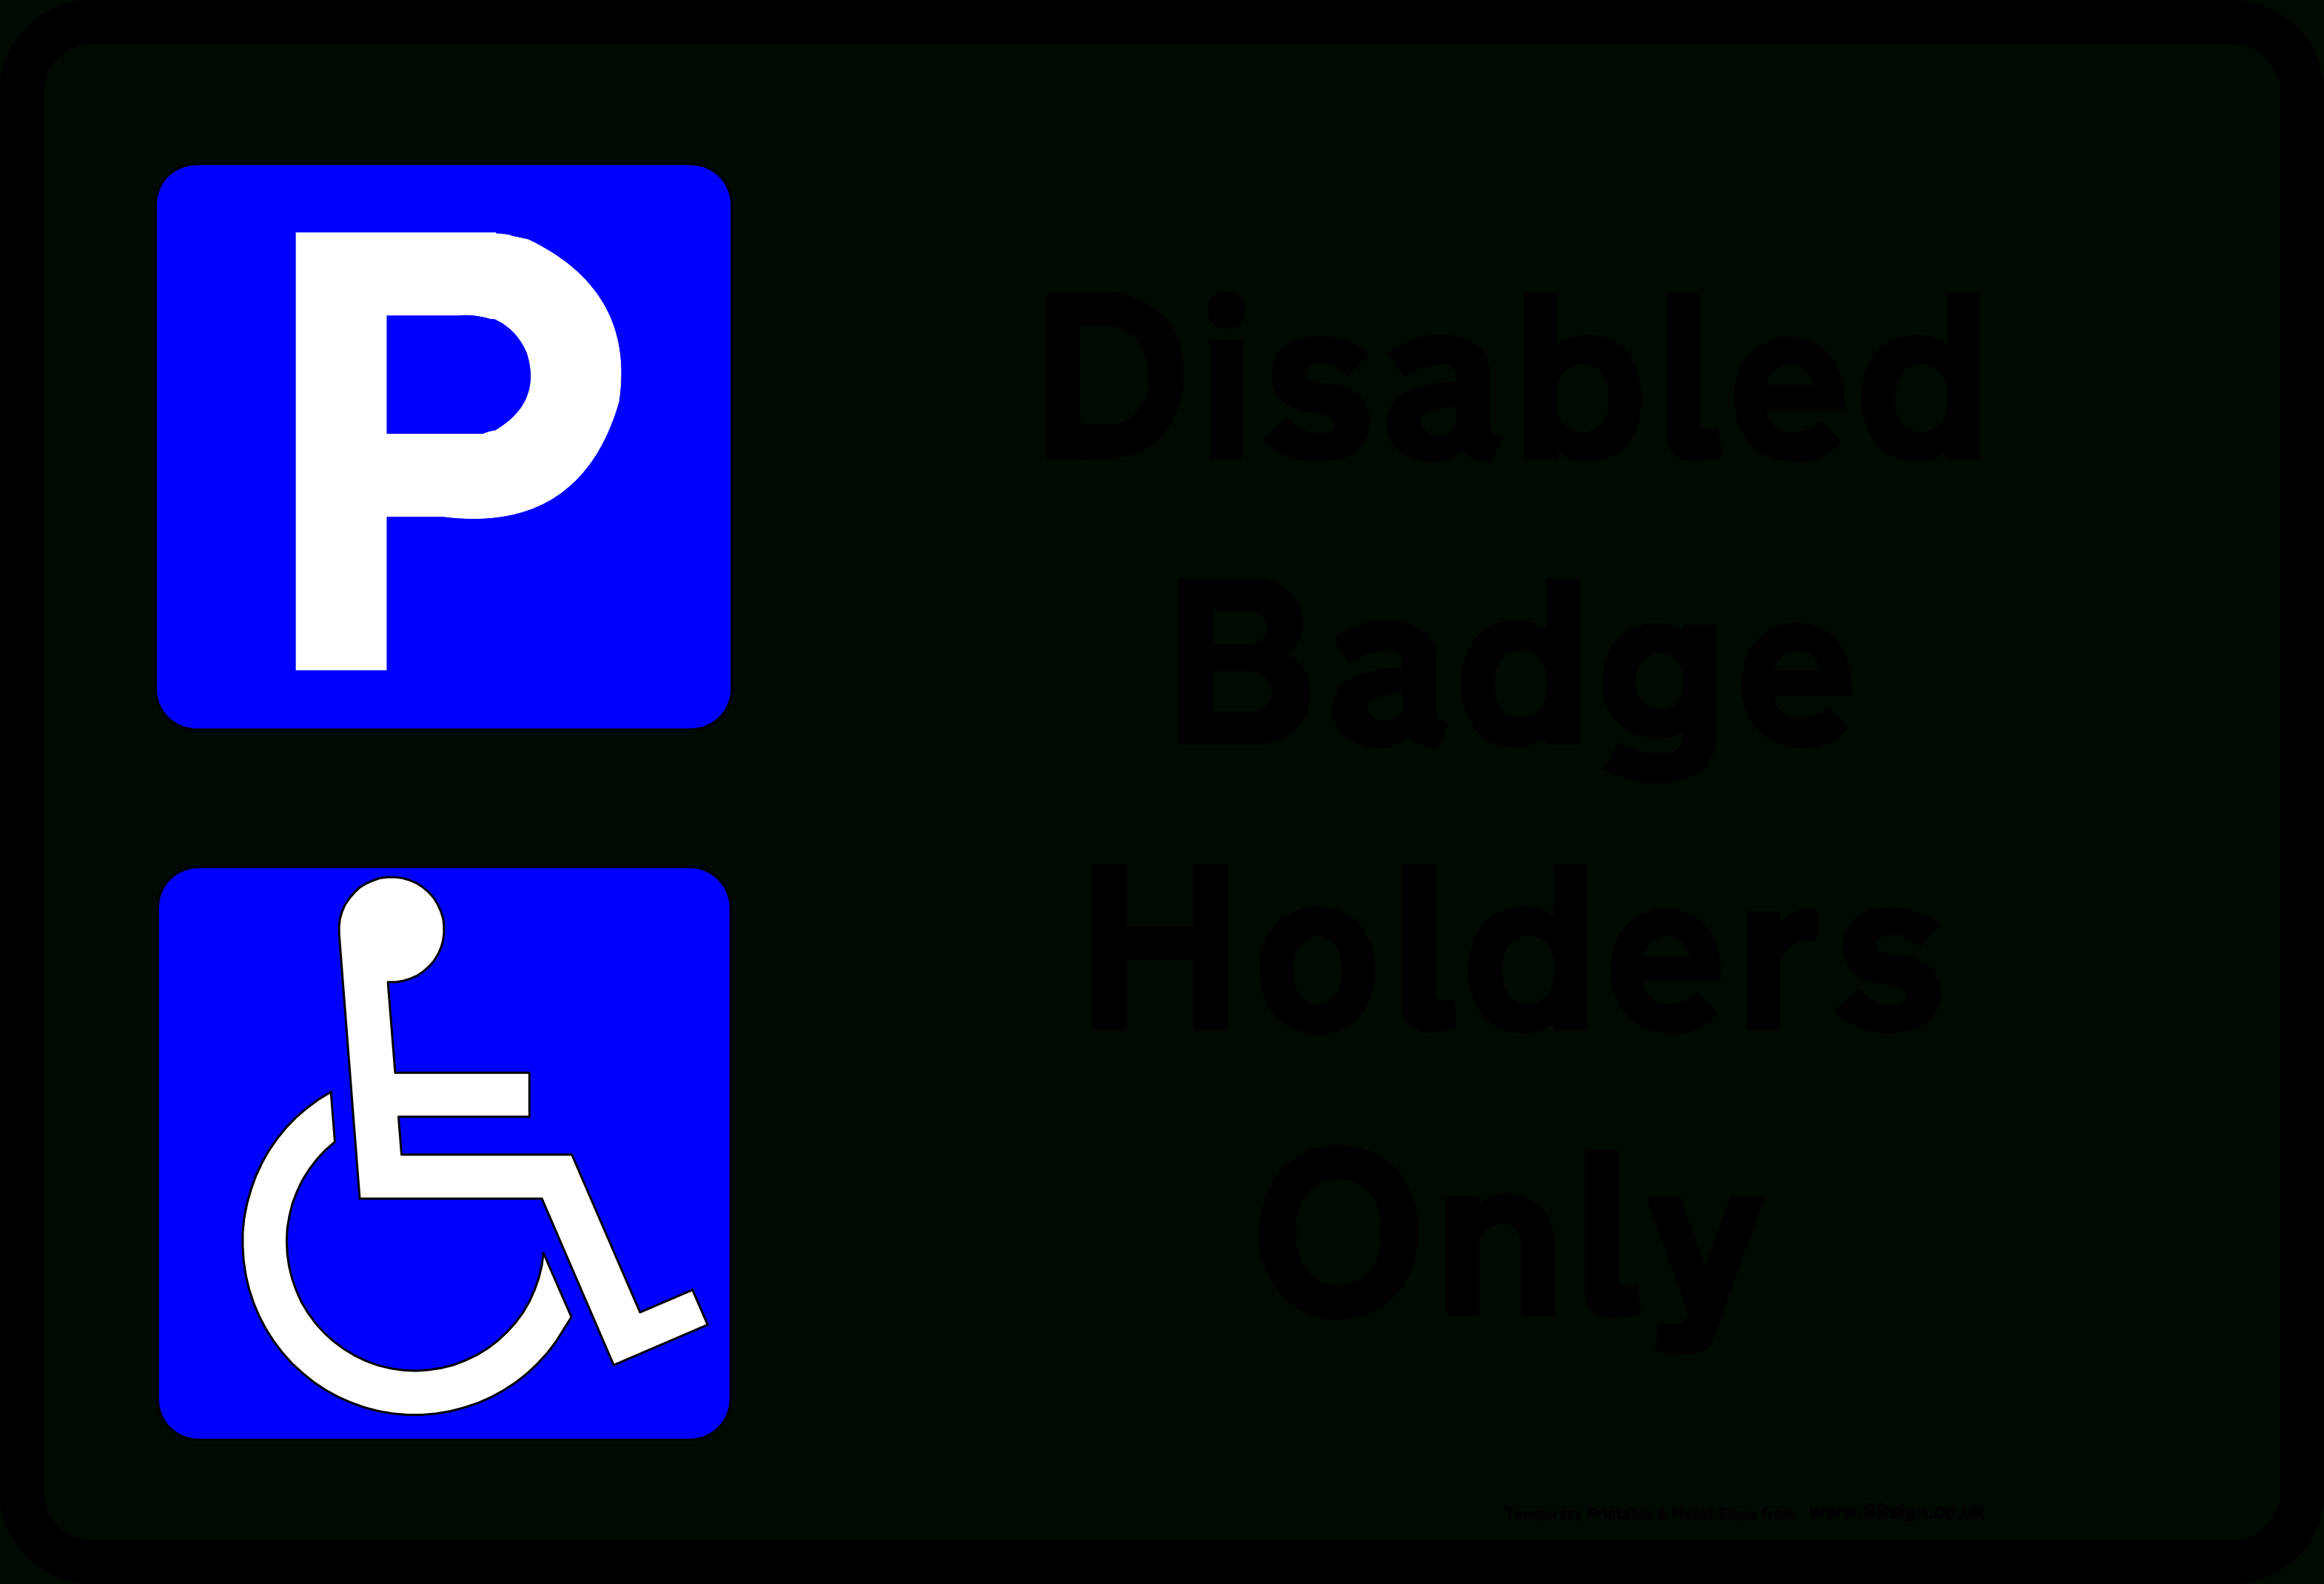 Free Printable Handicap Parking Signs, Download Free Clip Art, Free - Free Printable No Restroom Signs